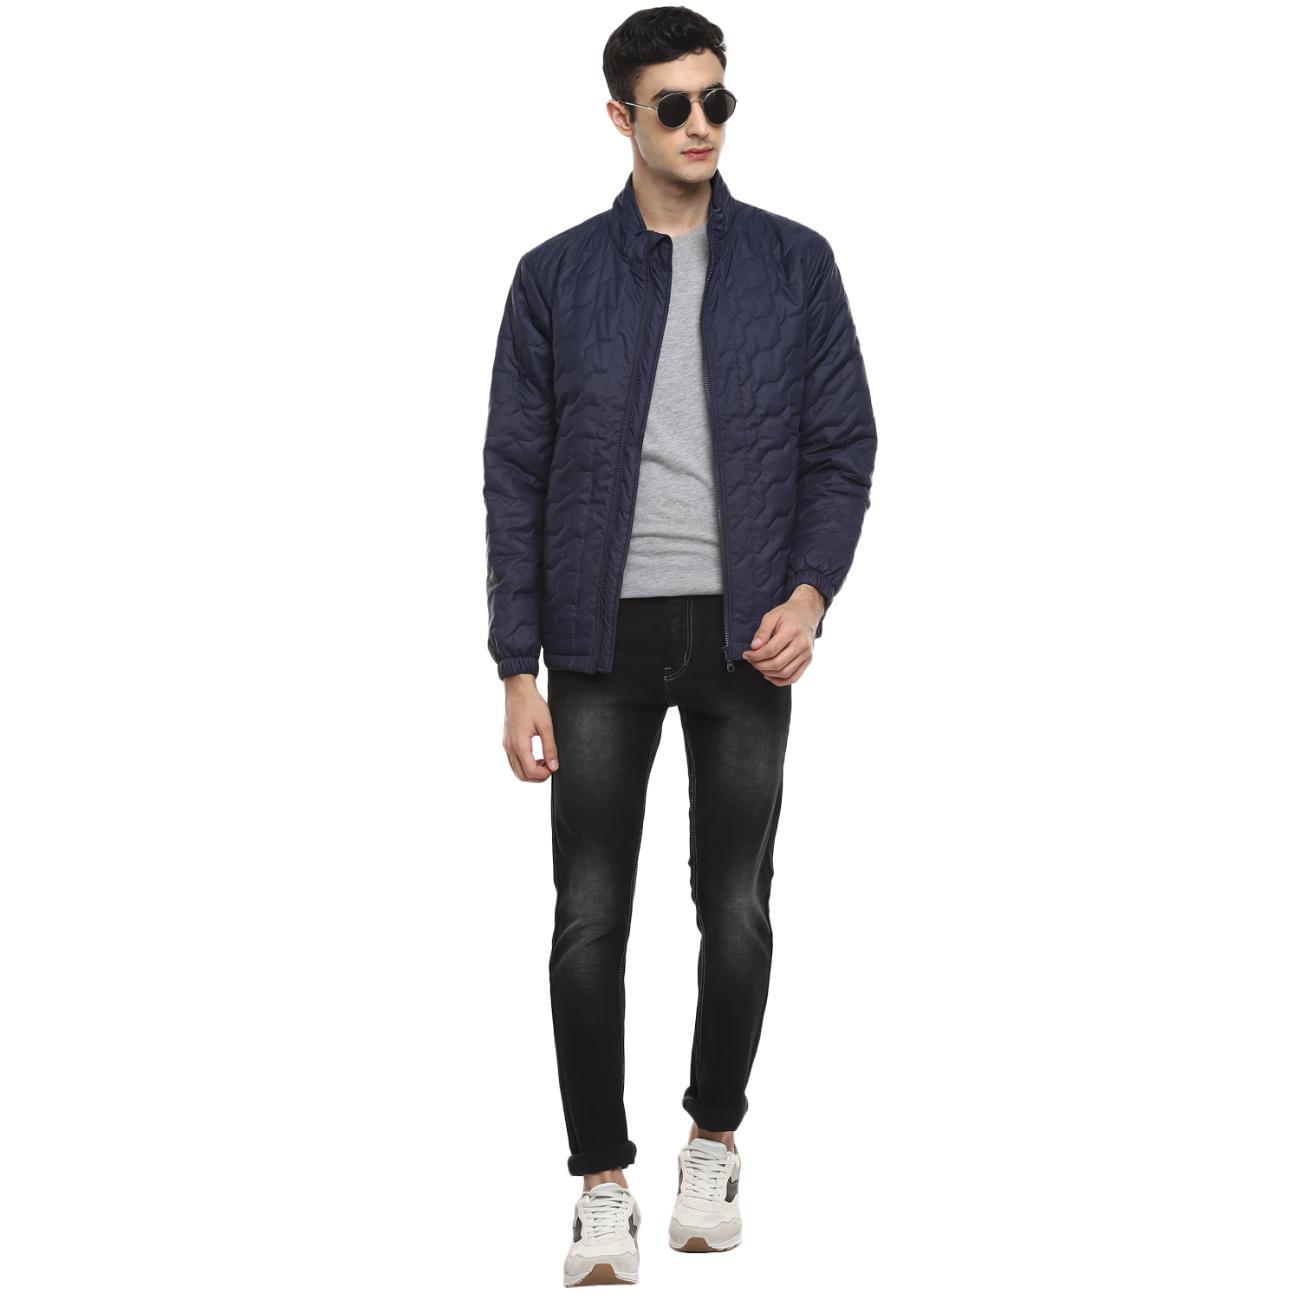 Shop Men's Navy Jacket